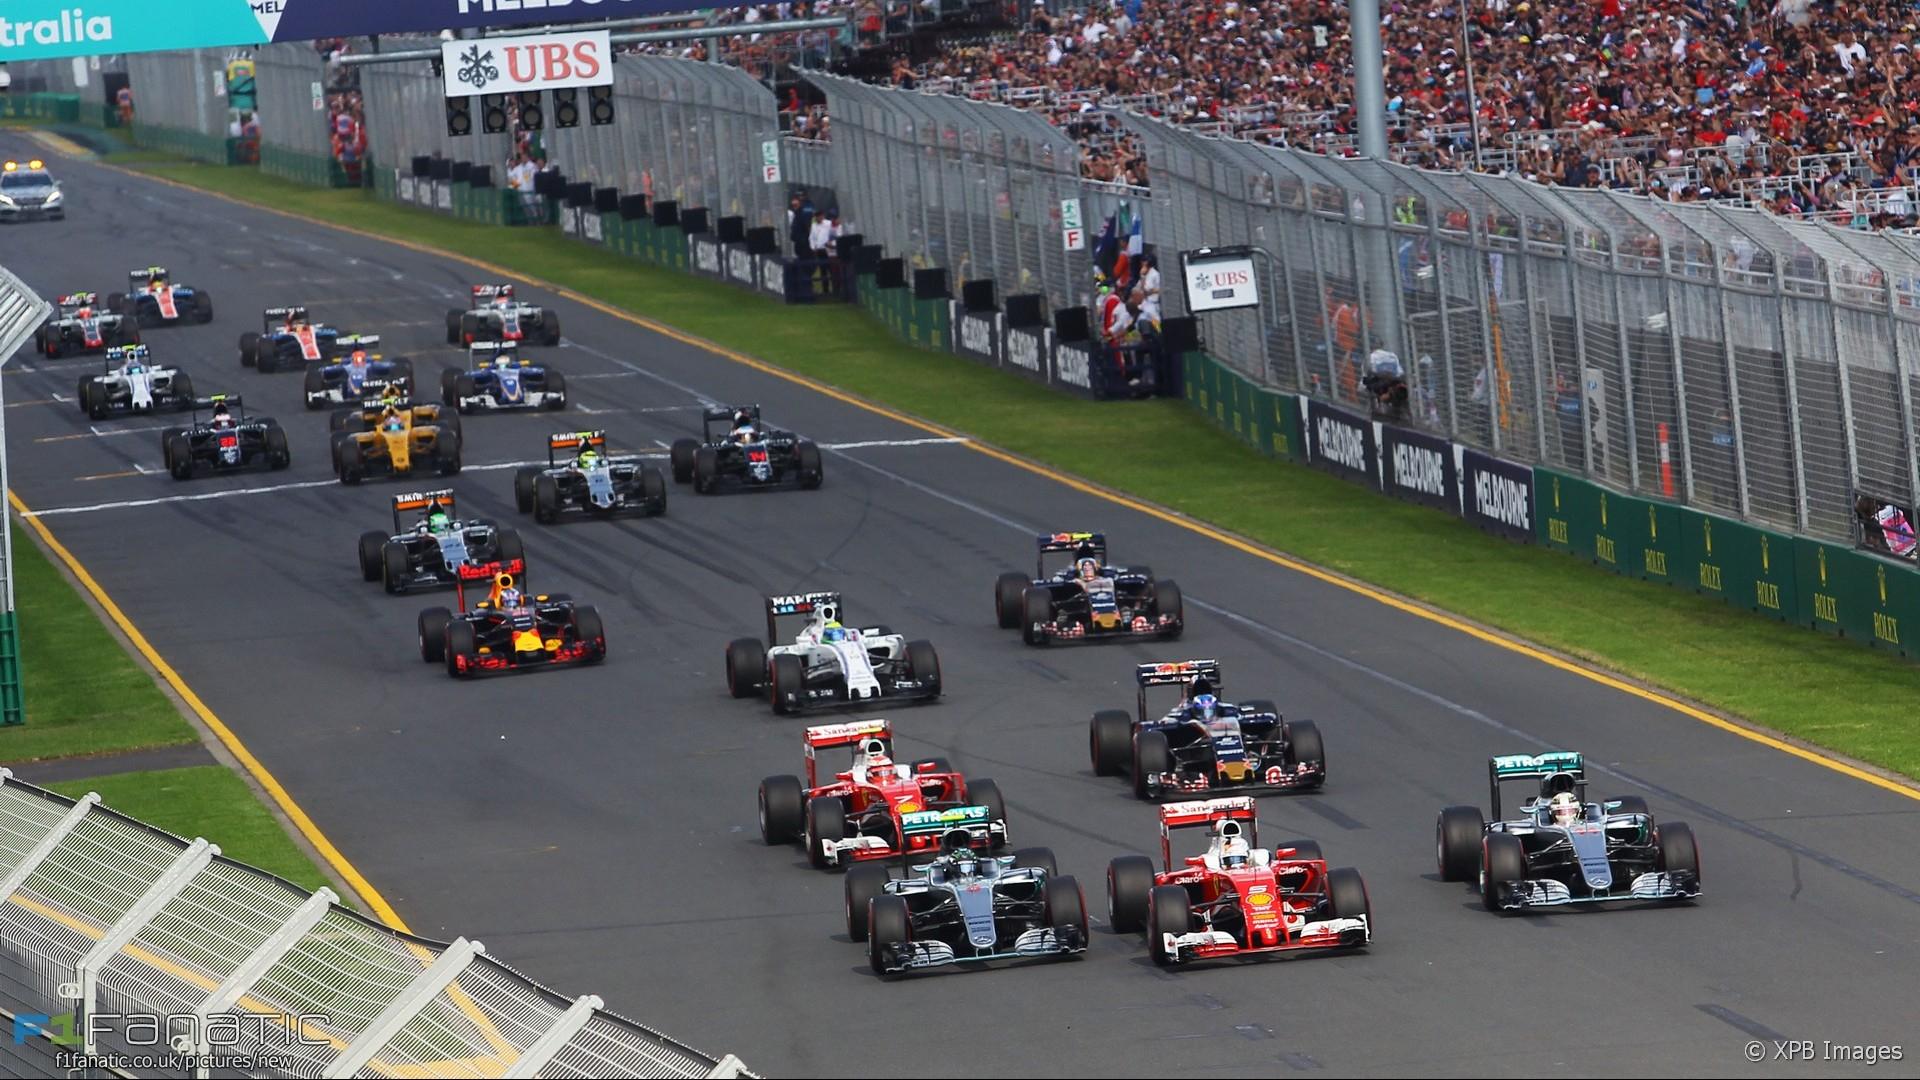 2020 Formula 1 Calendar